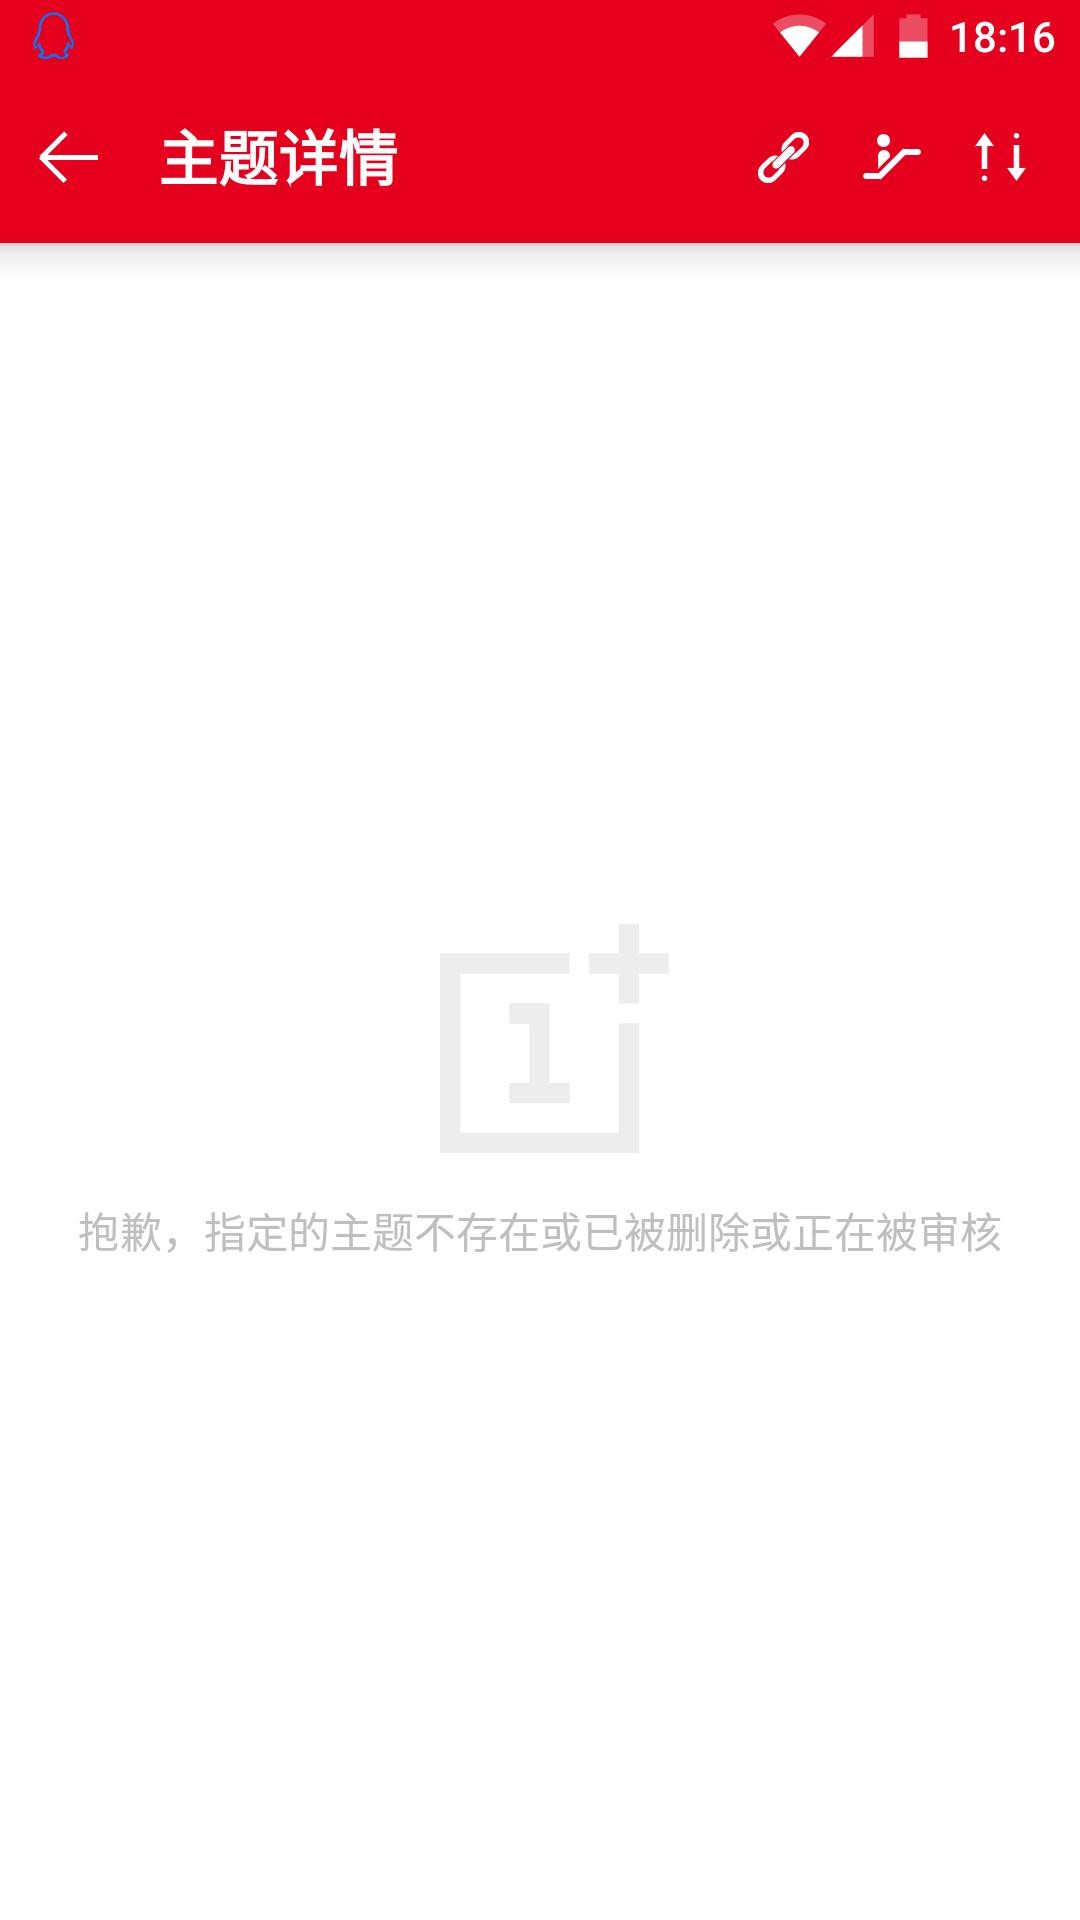 Screenshot_20161114-181641.png